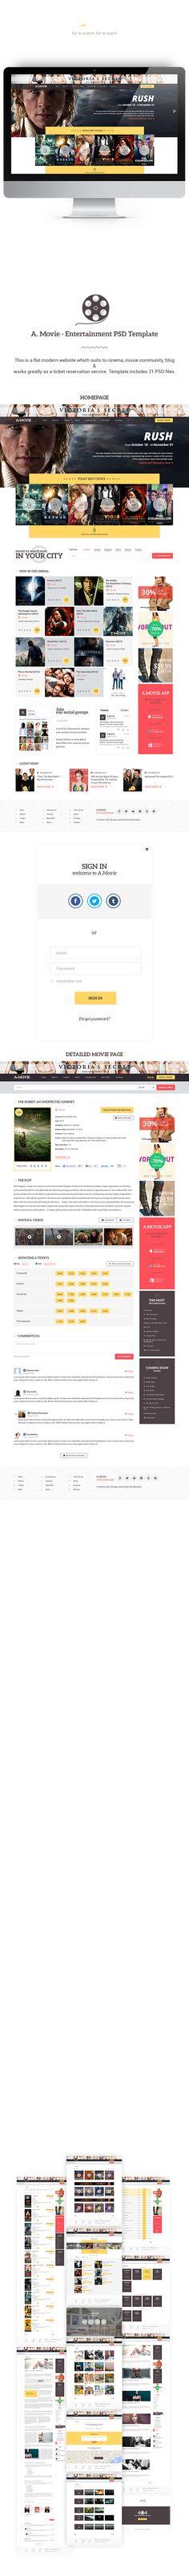 A.Movie - Cinema/Movie HTML Bootstrap Template